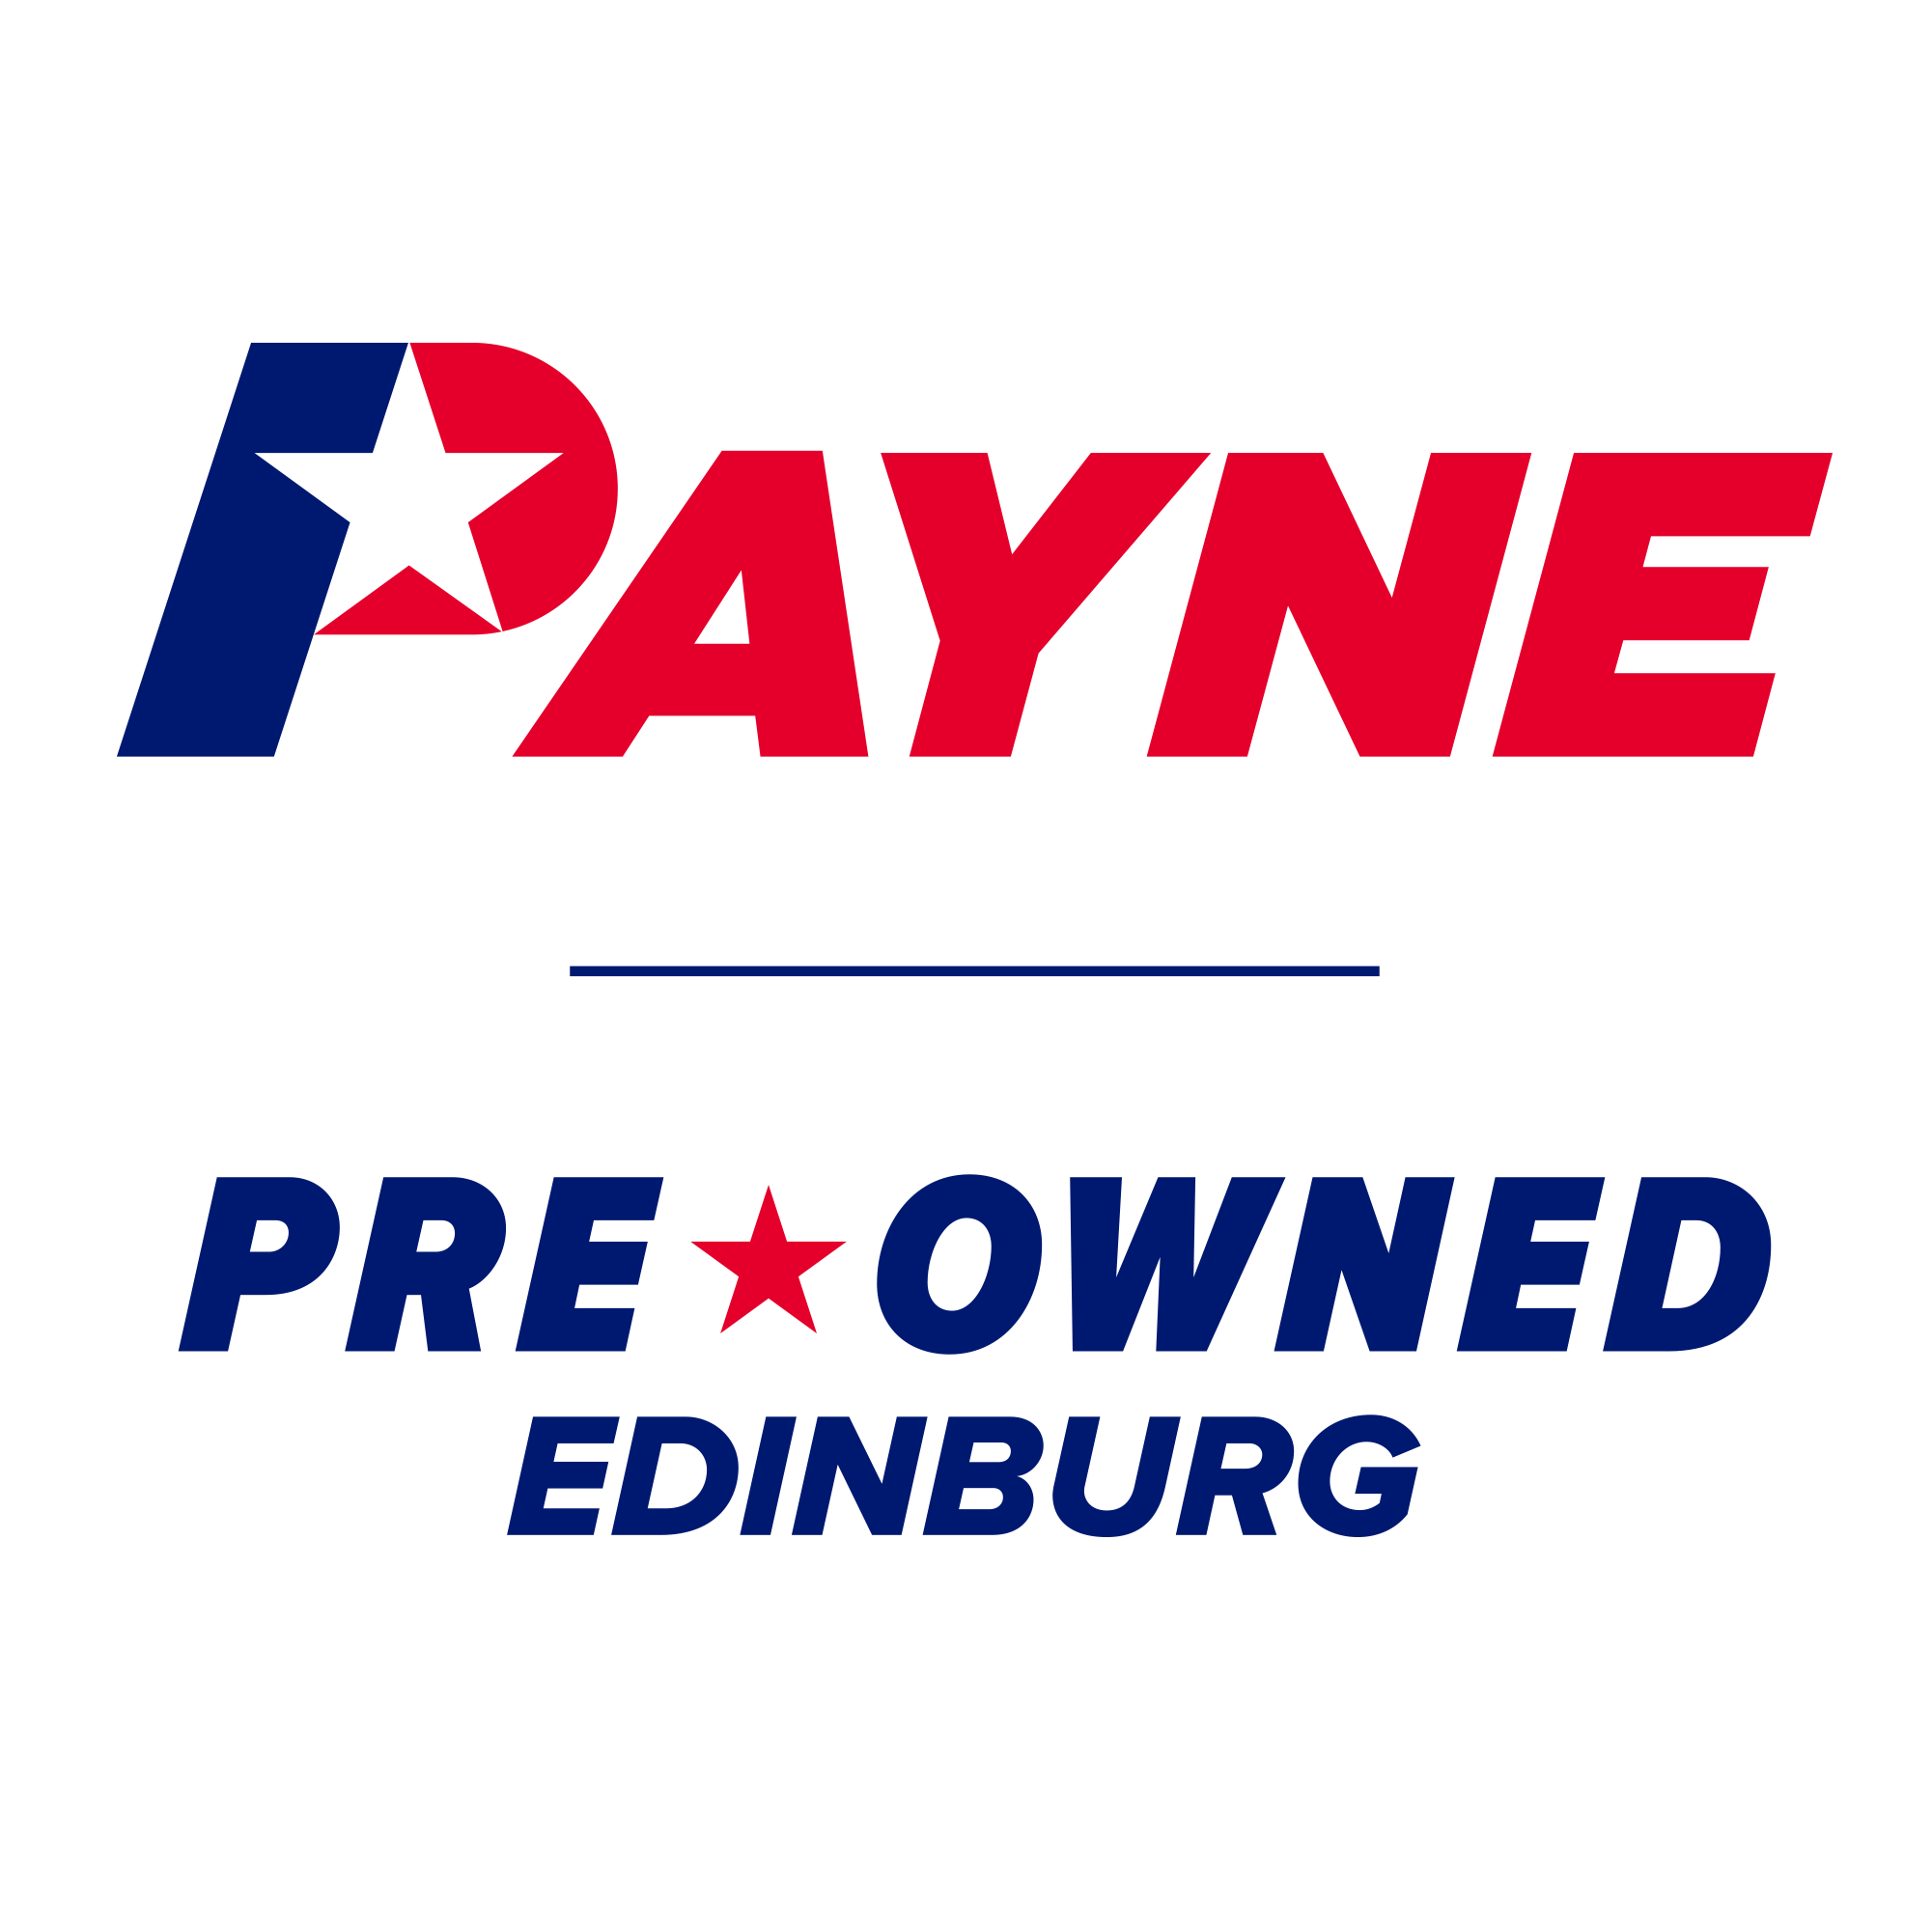 Payne Preowned Edinburg